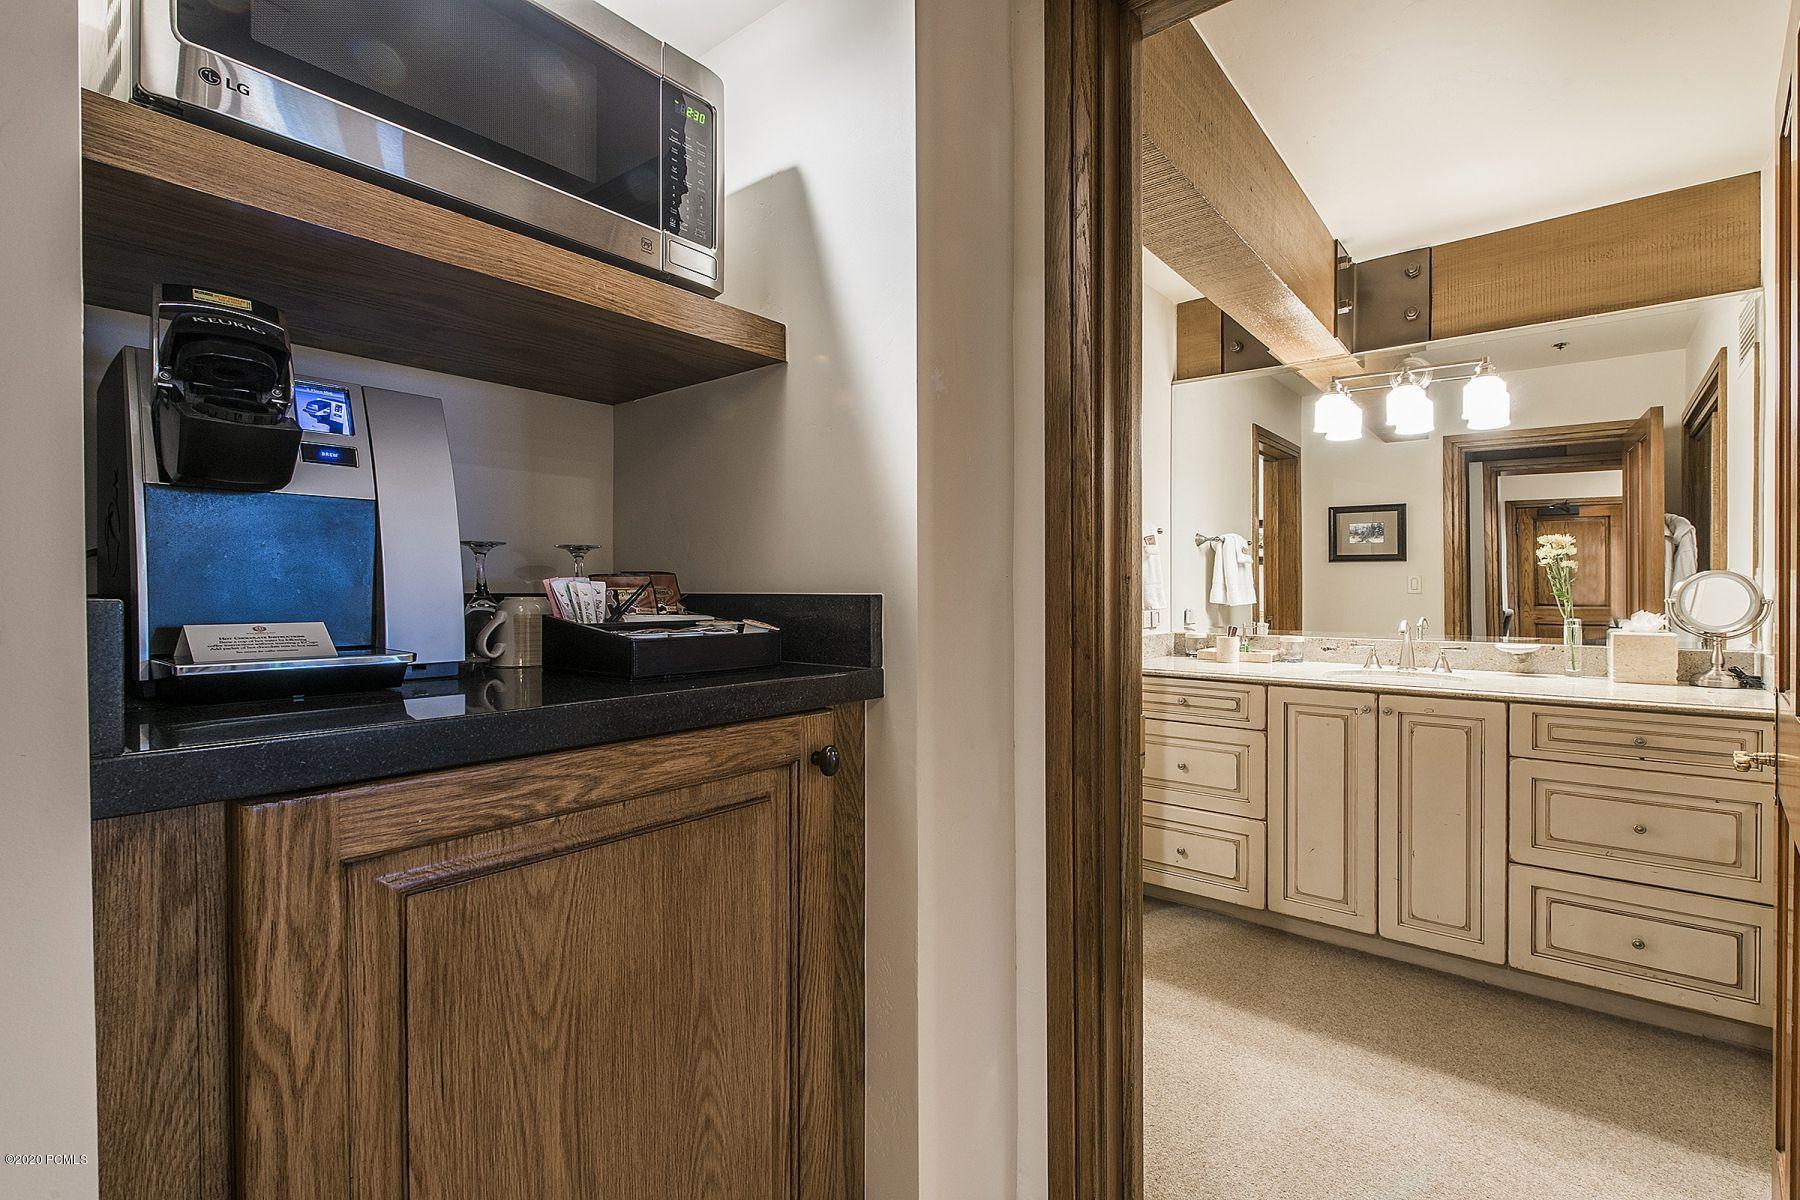 7700 Stein Way, Park City, Utah 84060, 4 Bedrooms Bedrooms, ,5 BathroomsBathrooms,Condominium,For Sale,Stein,12004187